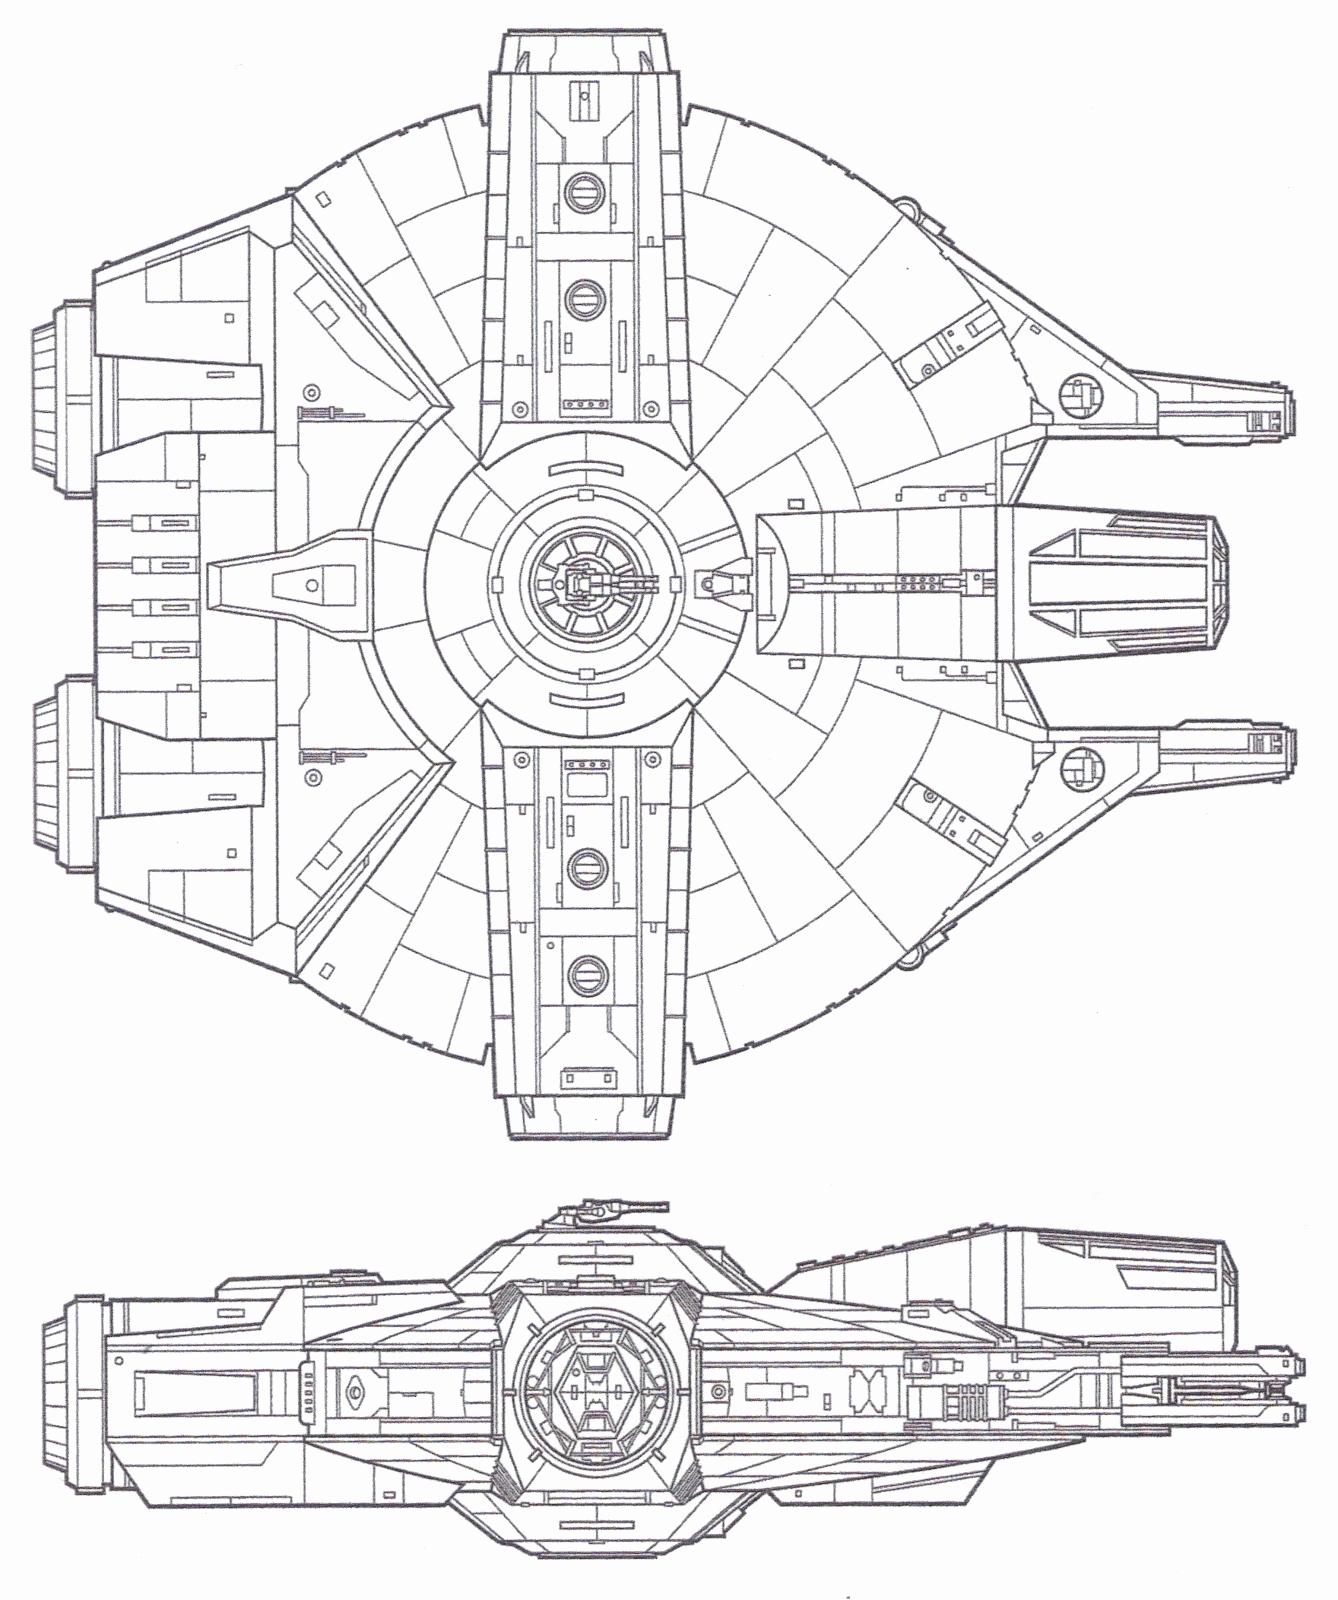 1338x1600 Millennium Falcon Floor Plan Lovely Gattaca Models And Props